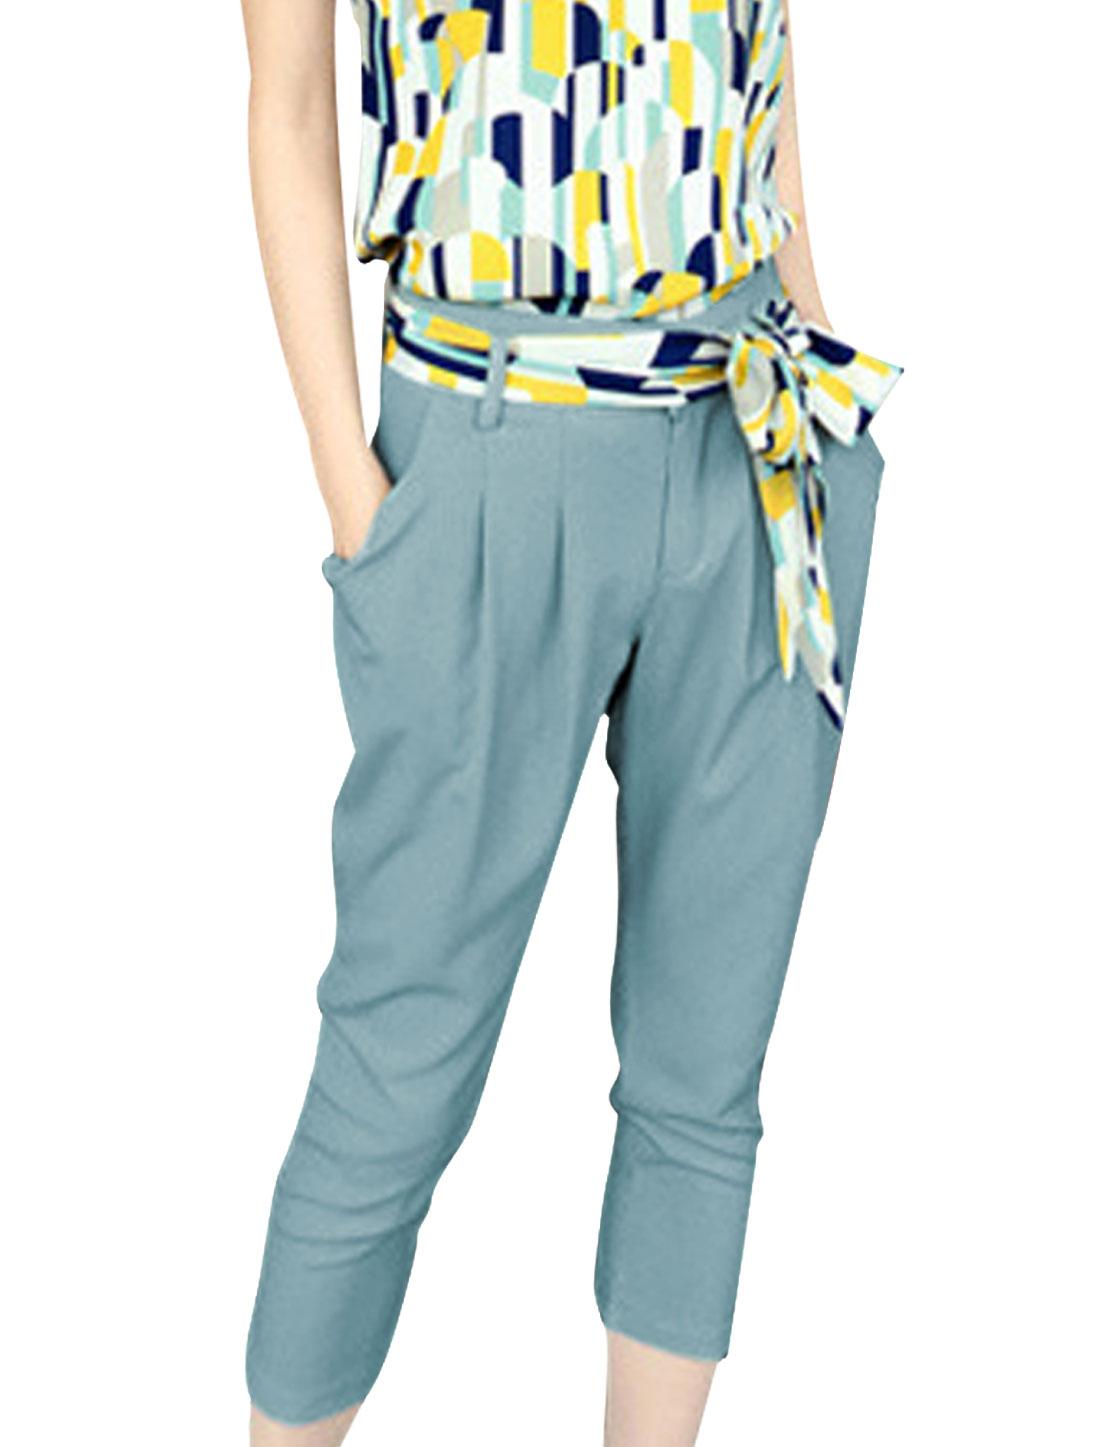 Ladies Zip Closure Fake Hip Pockets Capris Pants Teal XS